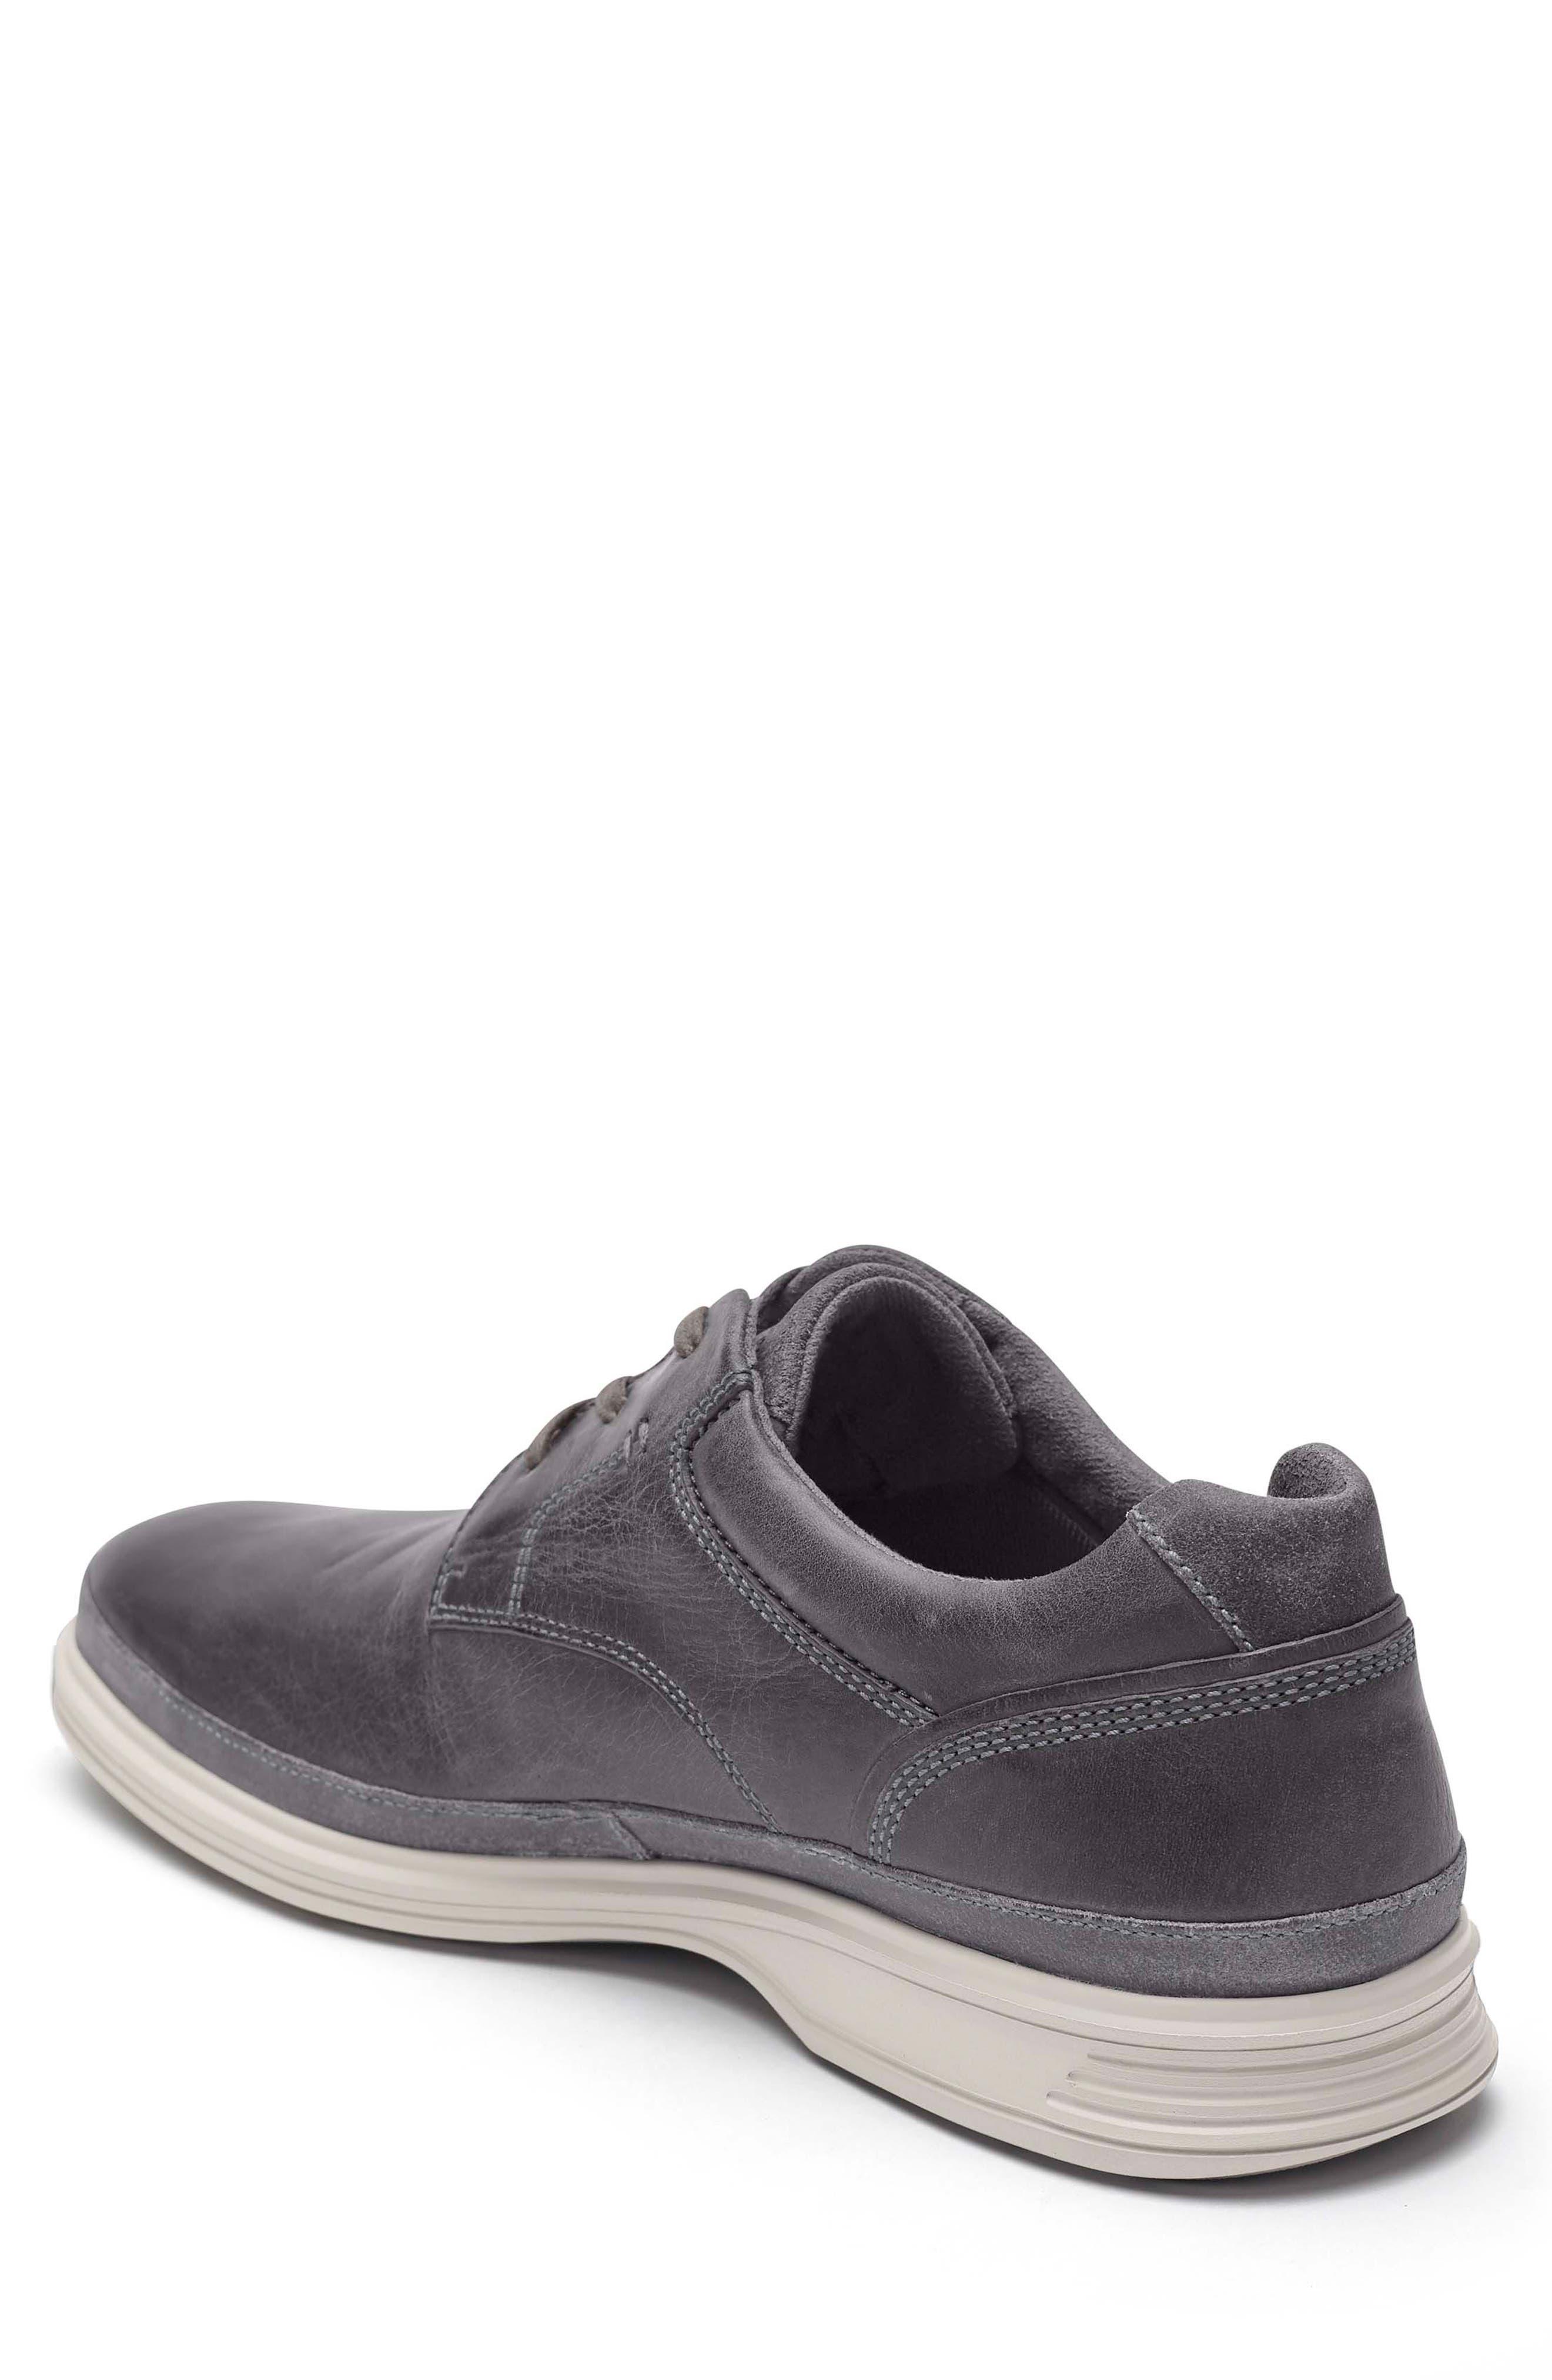 Dressports 2 Go Plain Toe Derby,                             Alternate thumbnail 2, color,                             Grey Leather